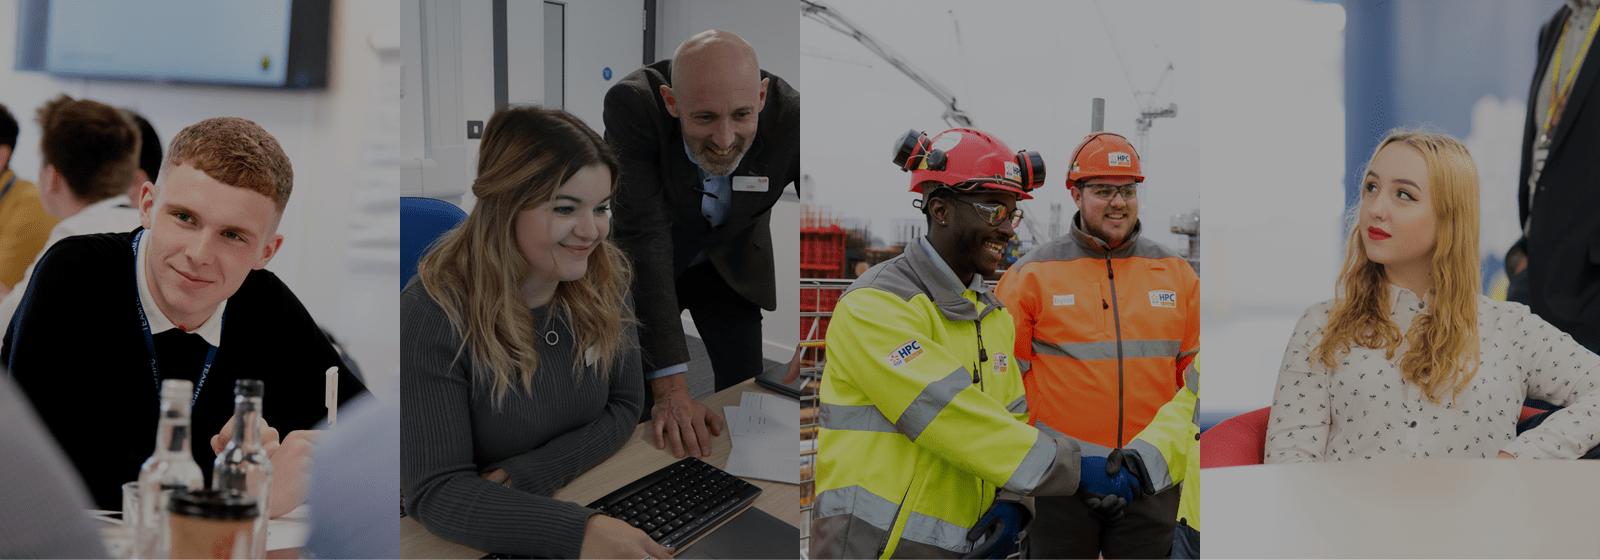 EDF Apprenticeships at Hinkley Point C